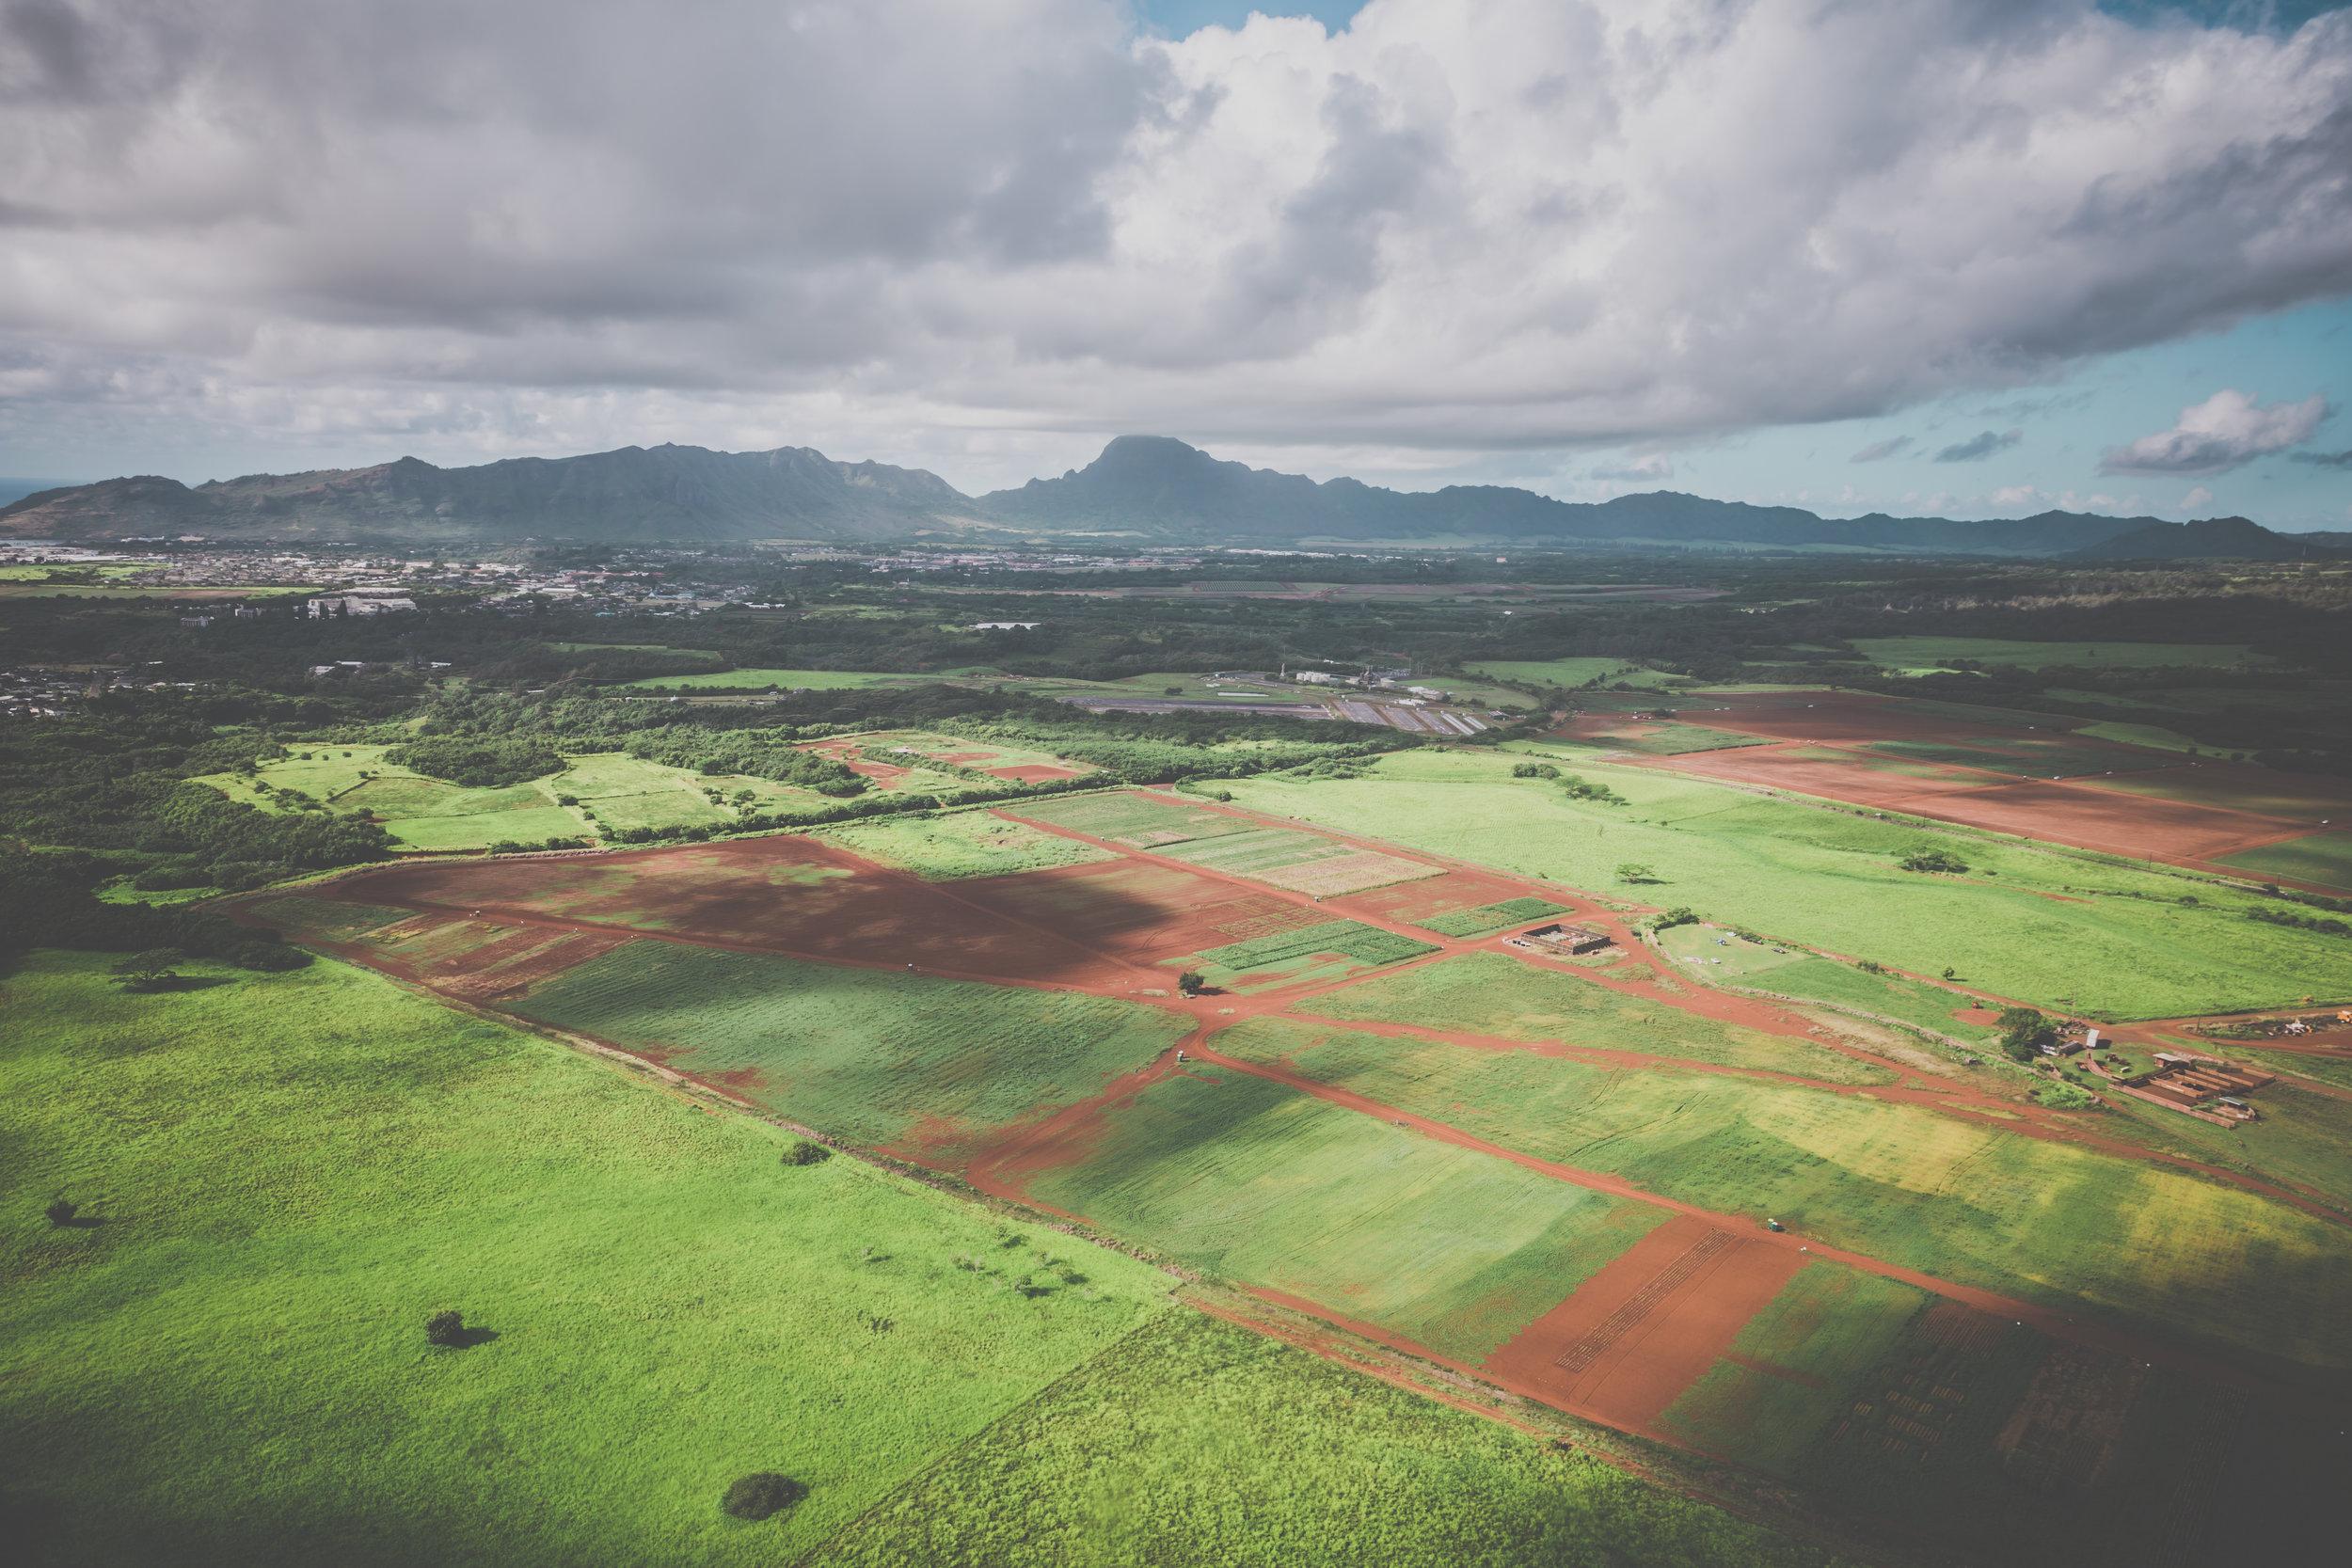 Land Use & Real Estate Development -